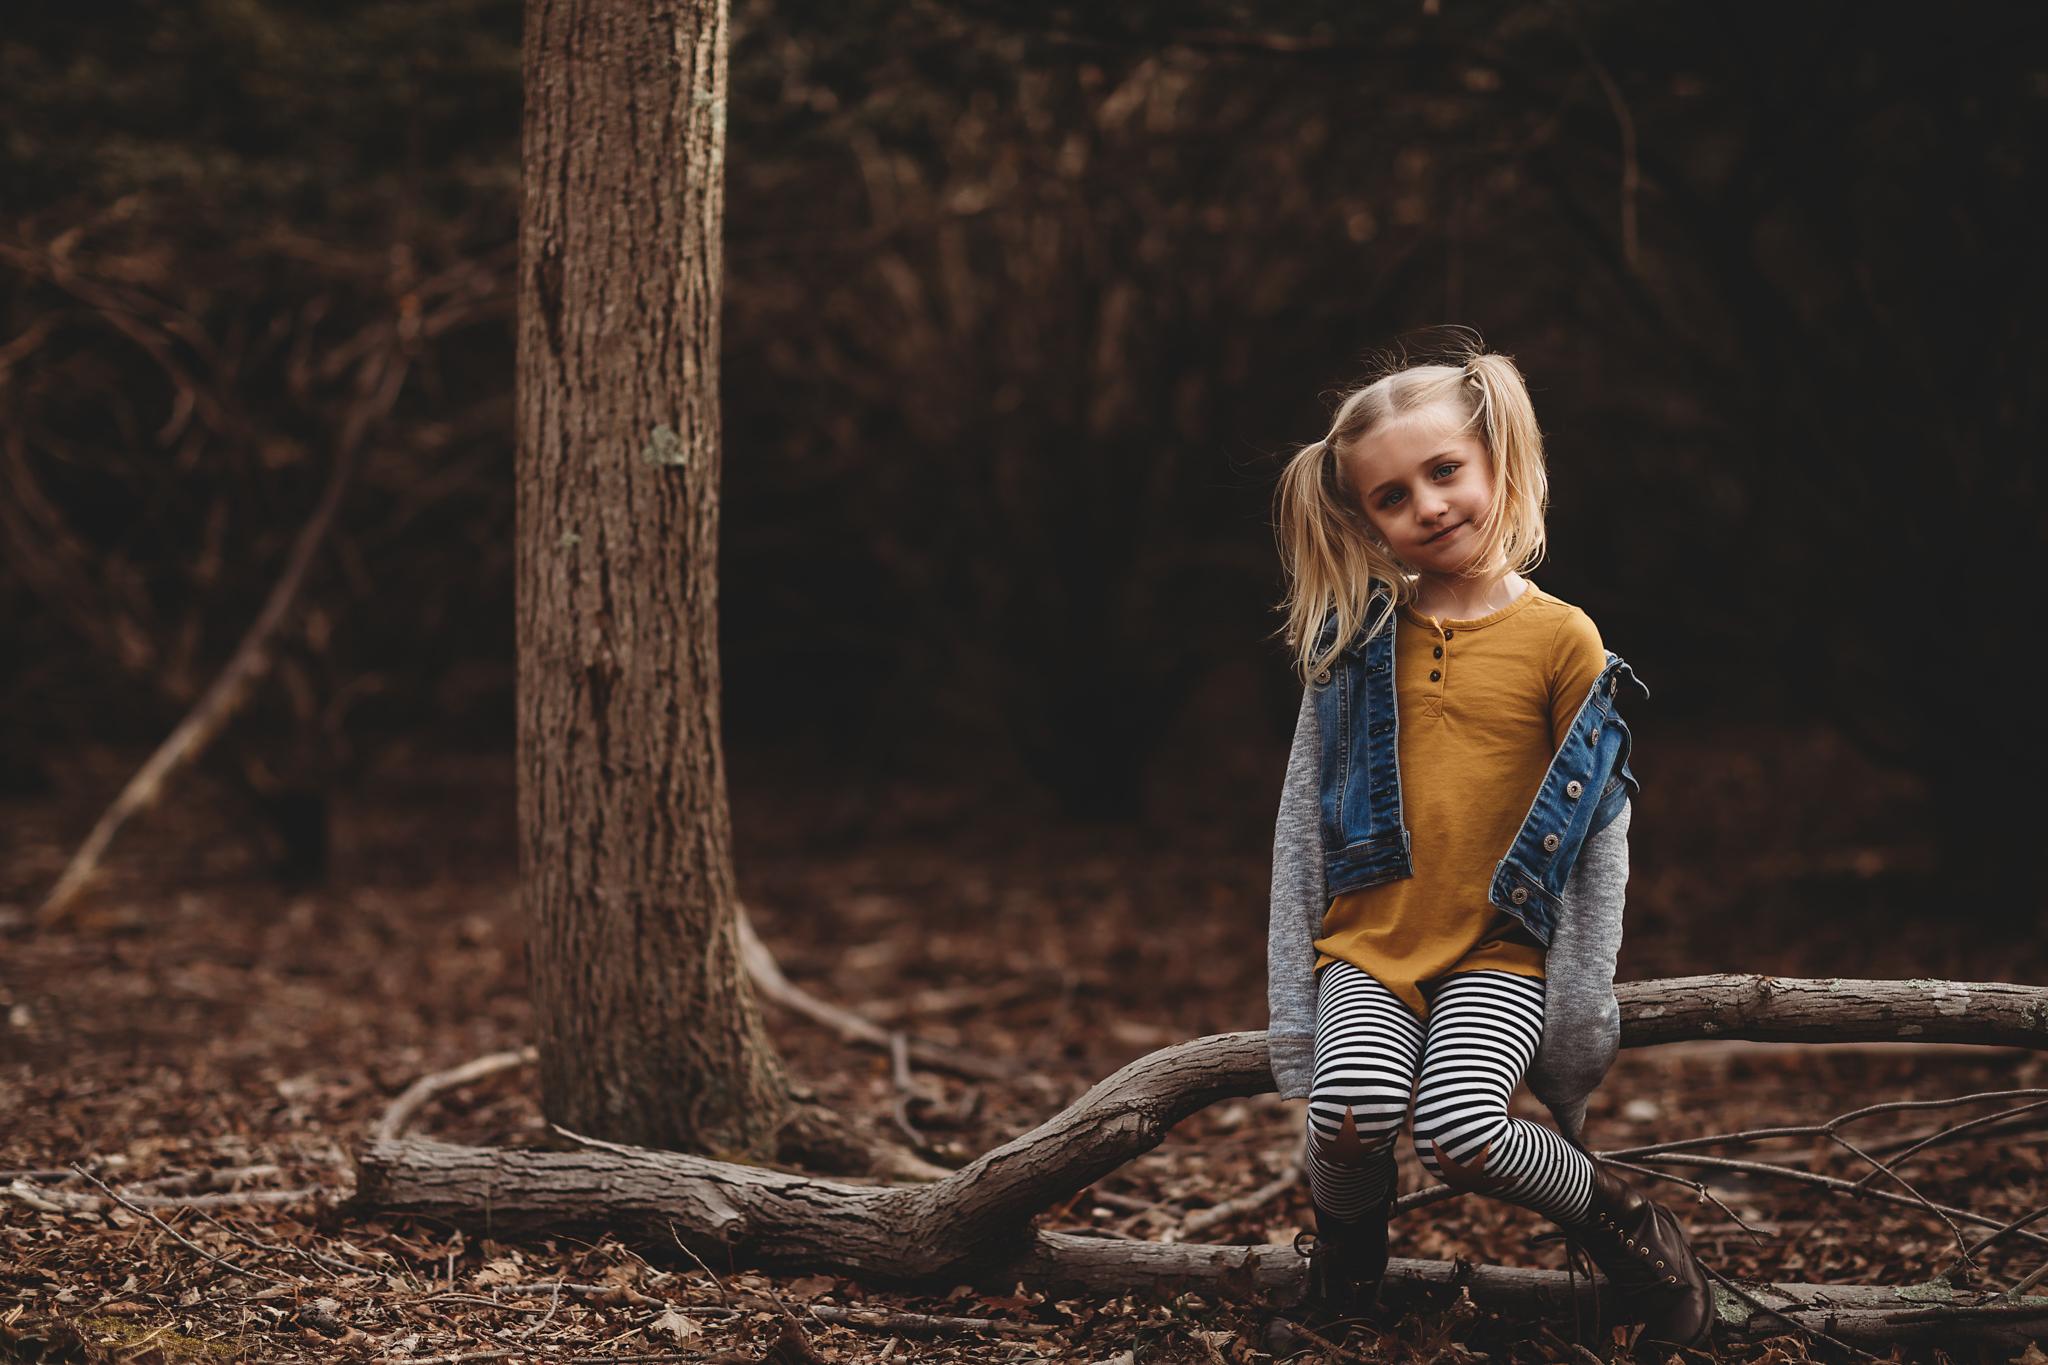 Long-island-photographer-hello-olivia-photography-children-kids-photos-new-york-lifestyle-portraits-suffolk-County-LI-52.jpg